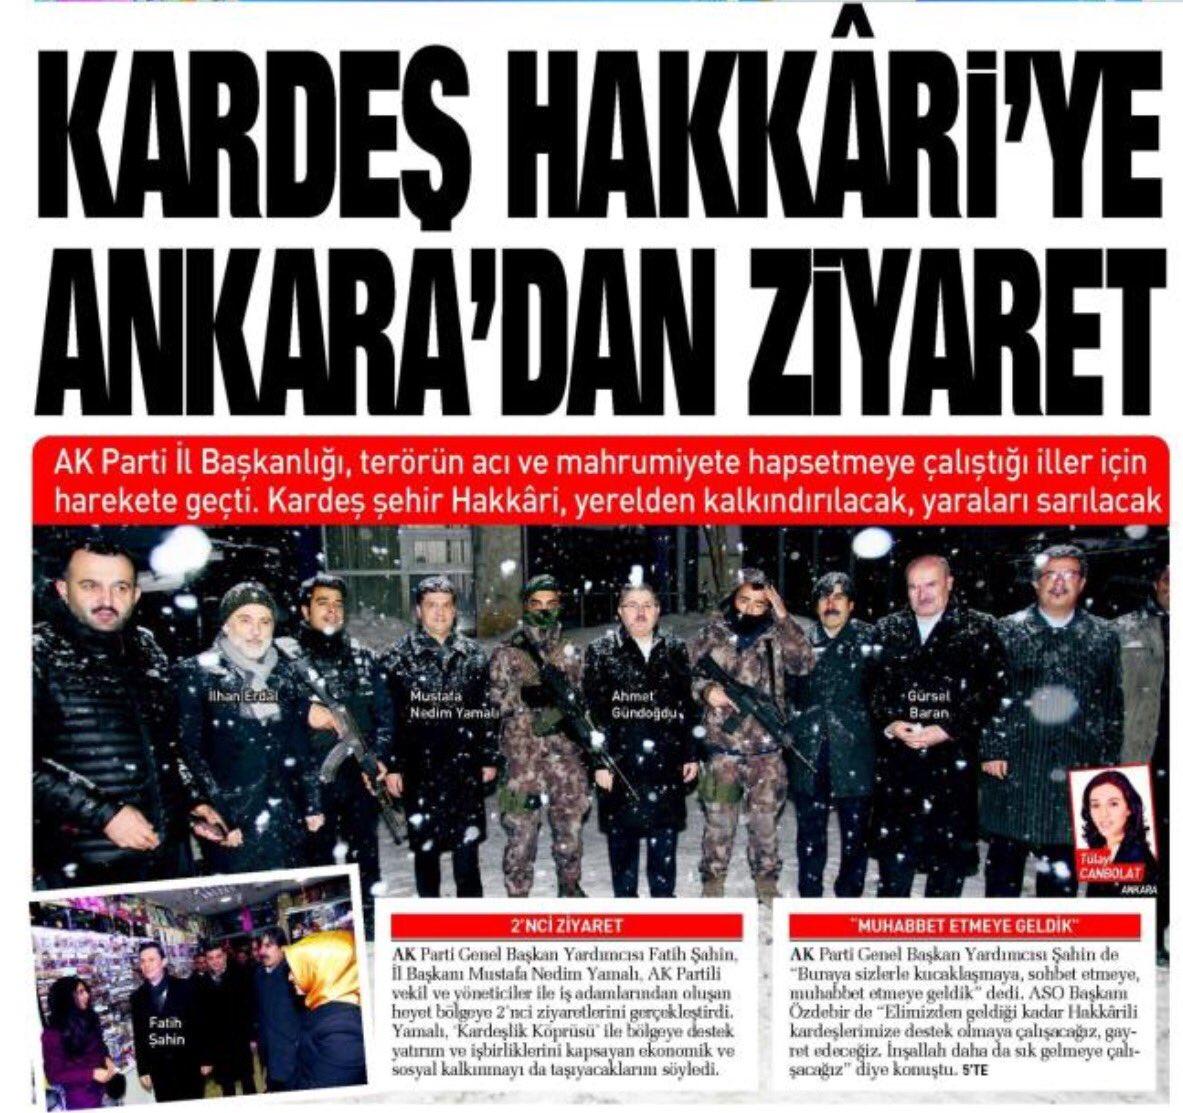 Ankara'dan Hakkari'ye Gönül Köprüsü... https://t.co/7tG2J8wRBY